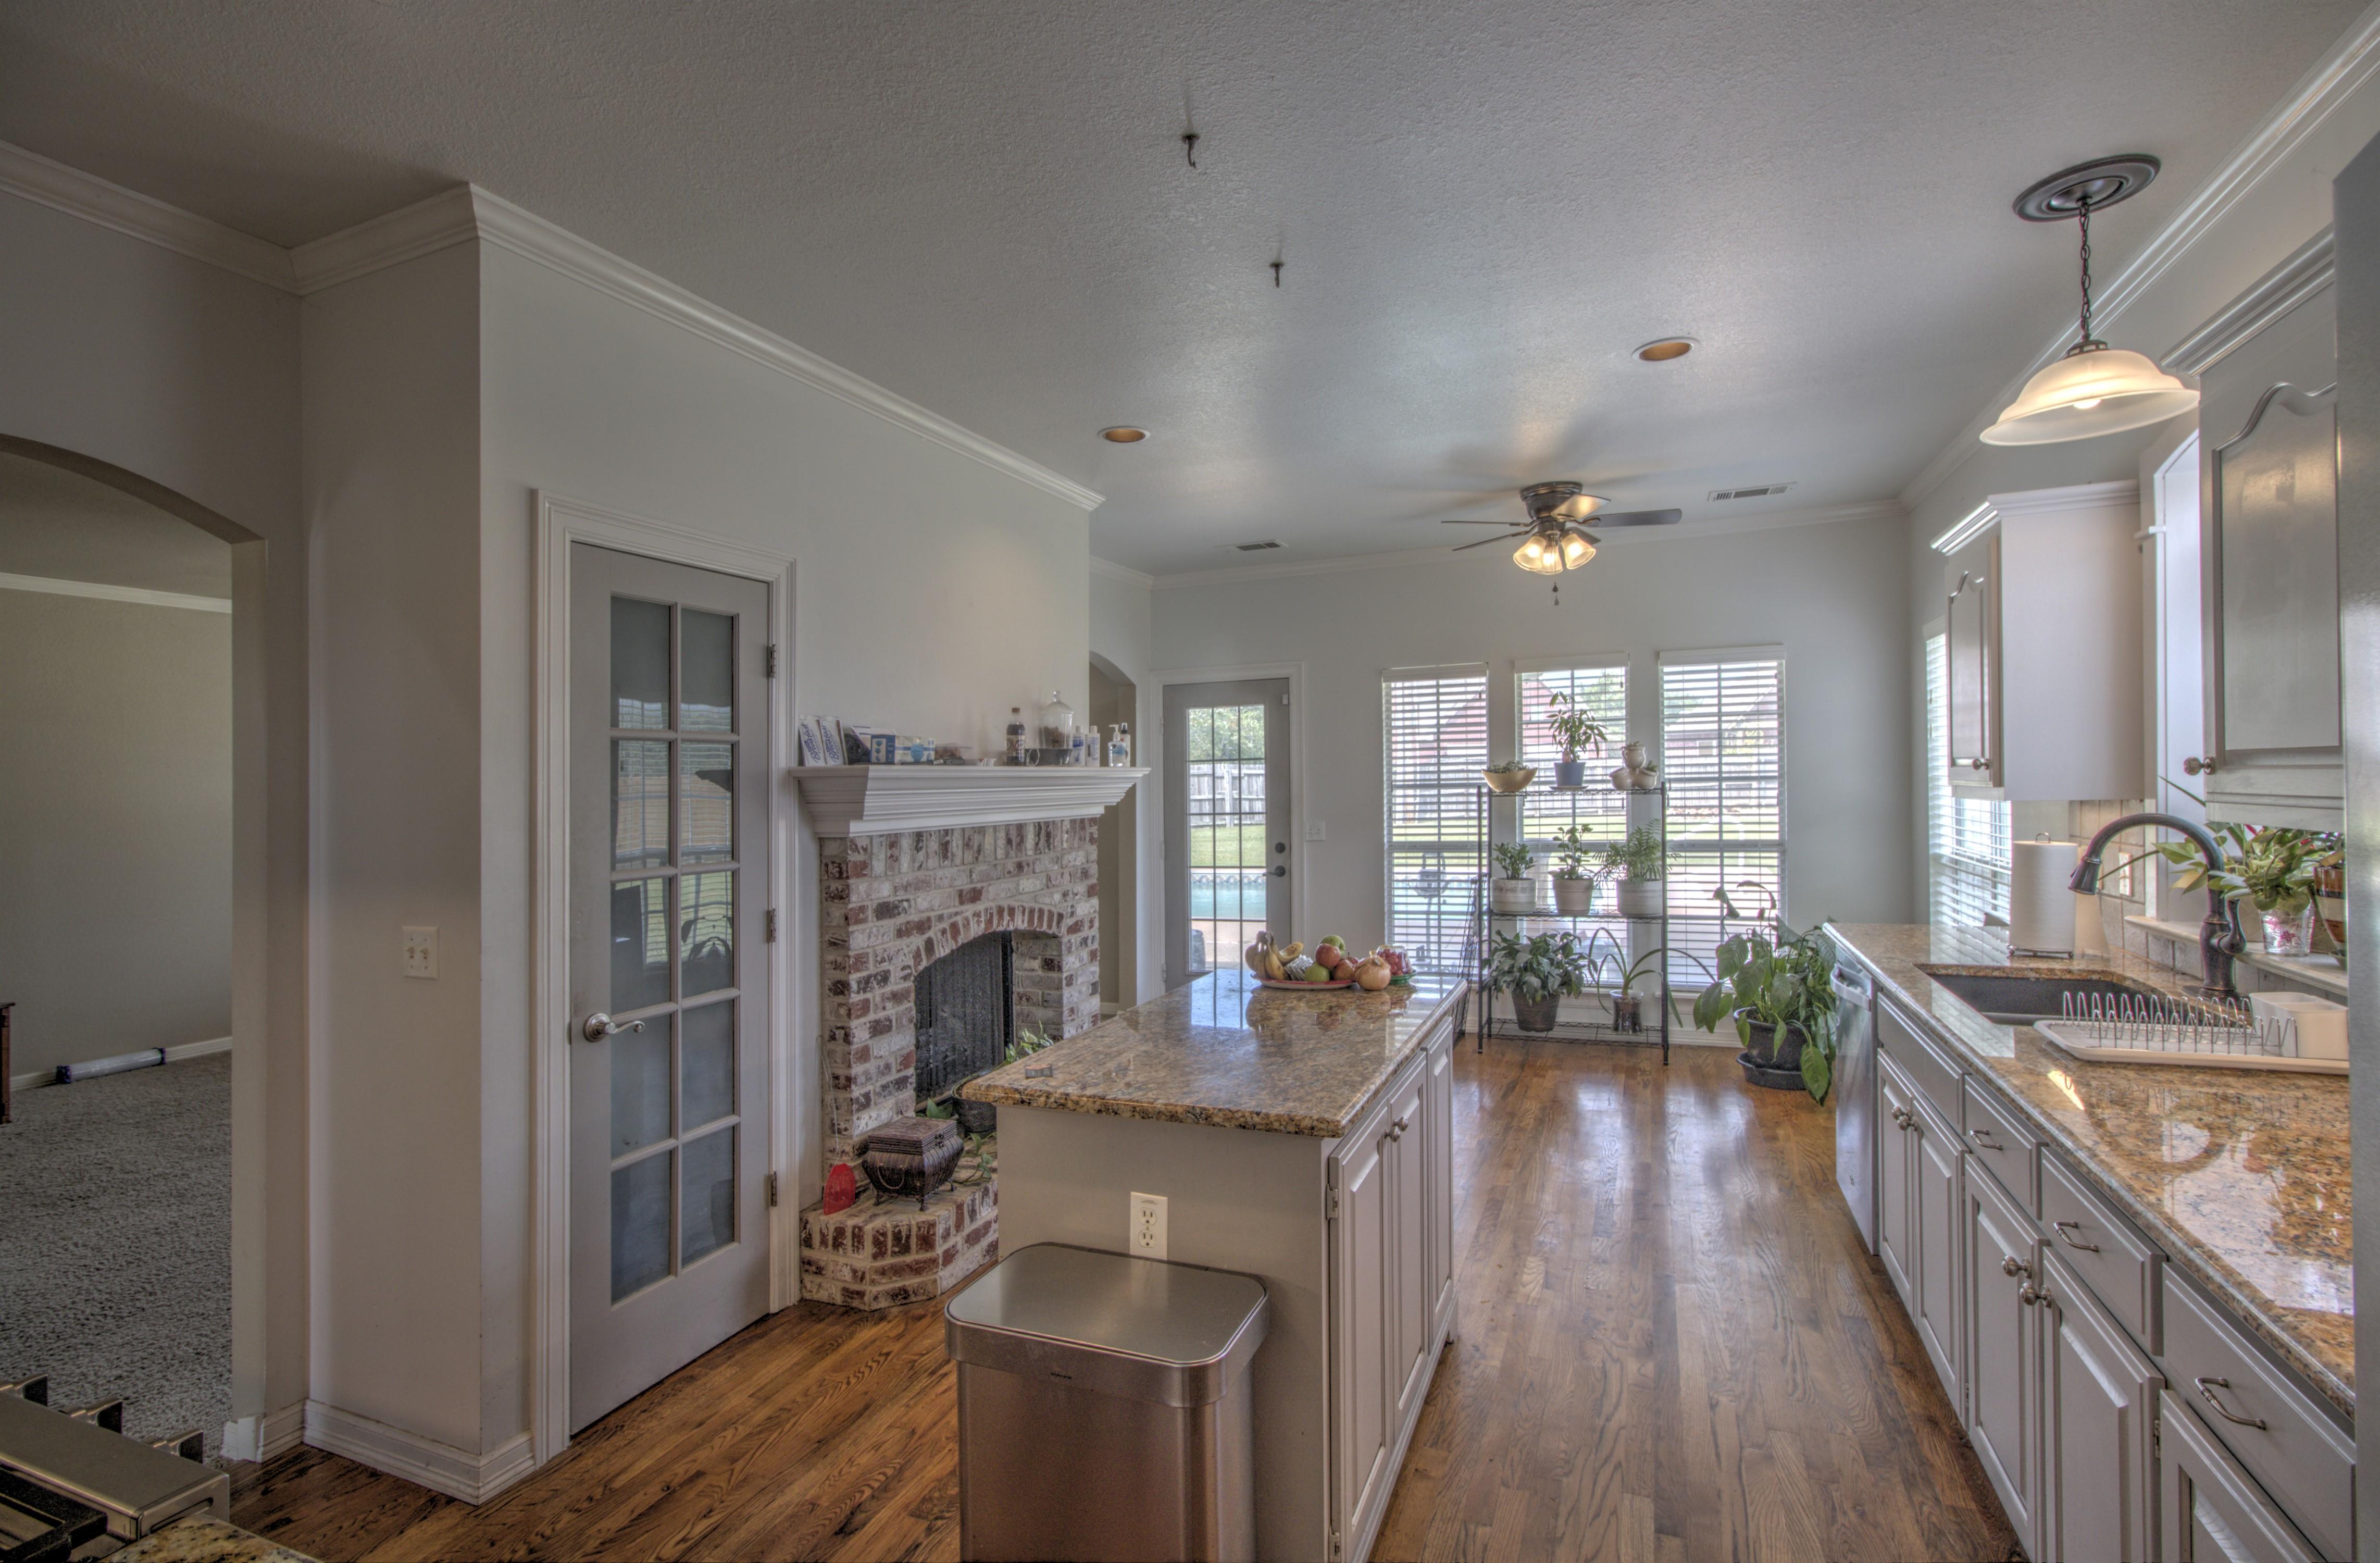 9021 N 137th East Avenue Property Photo 11